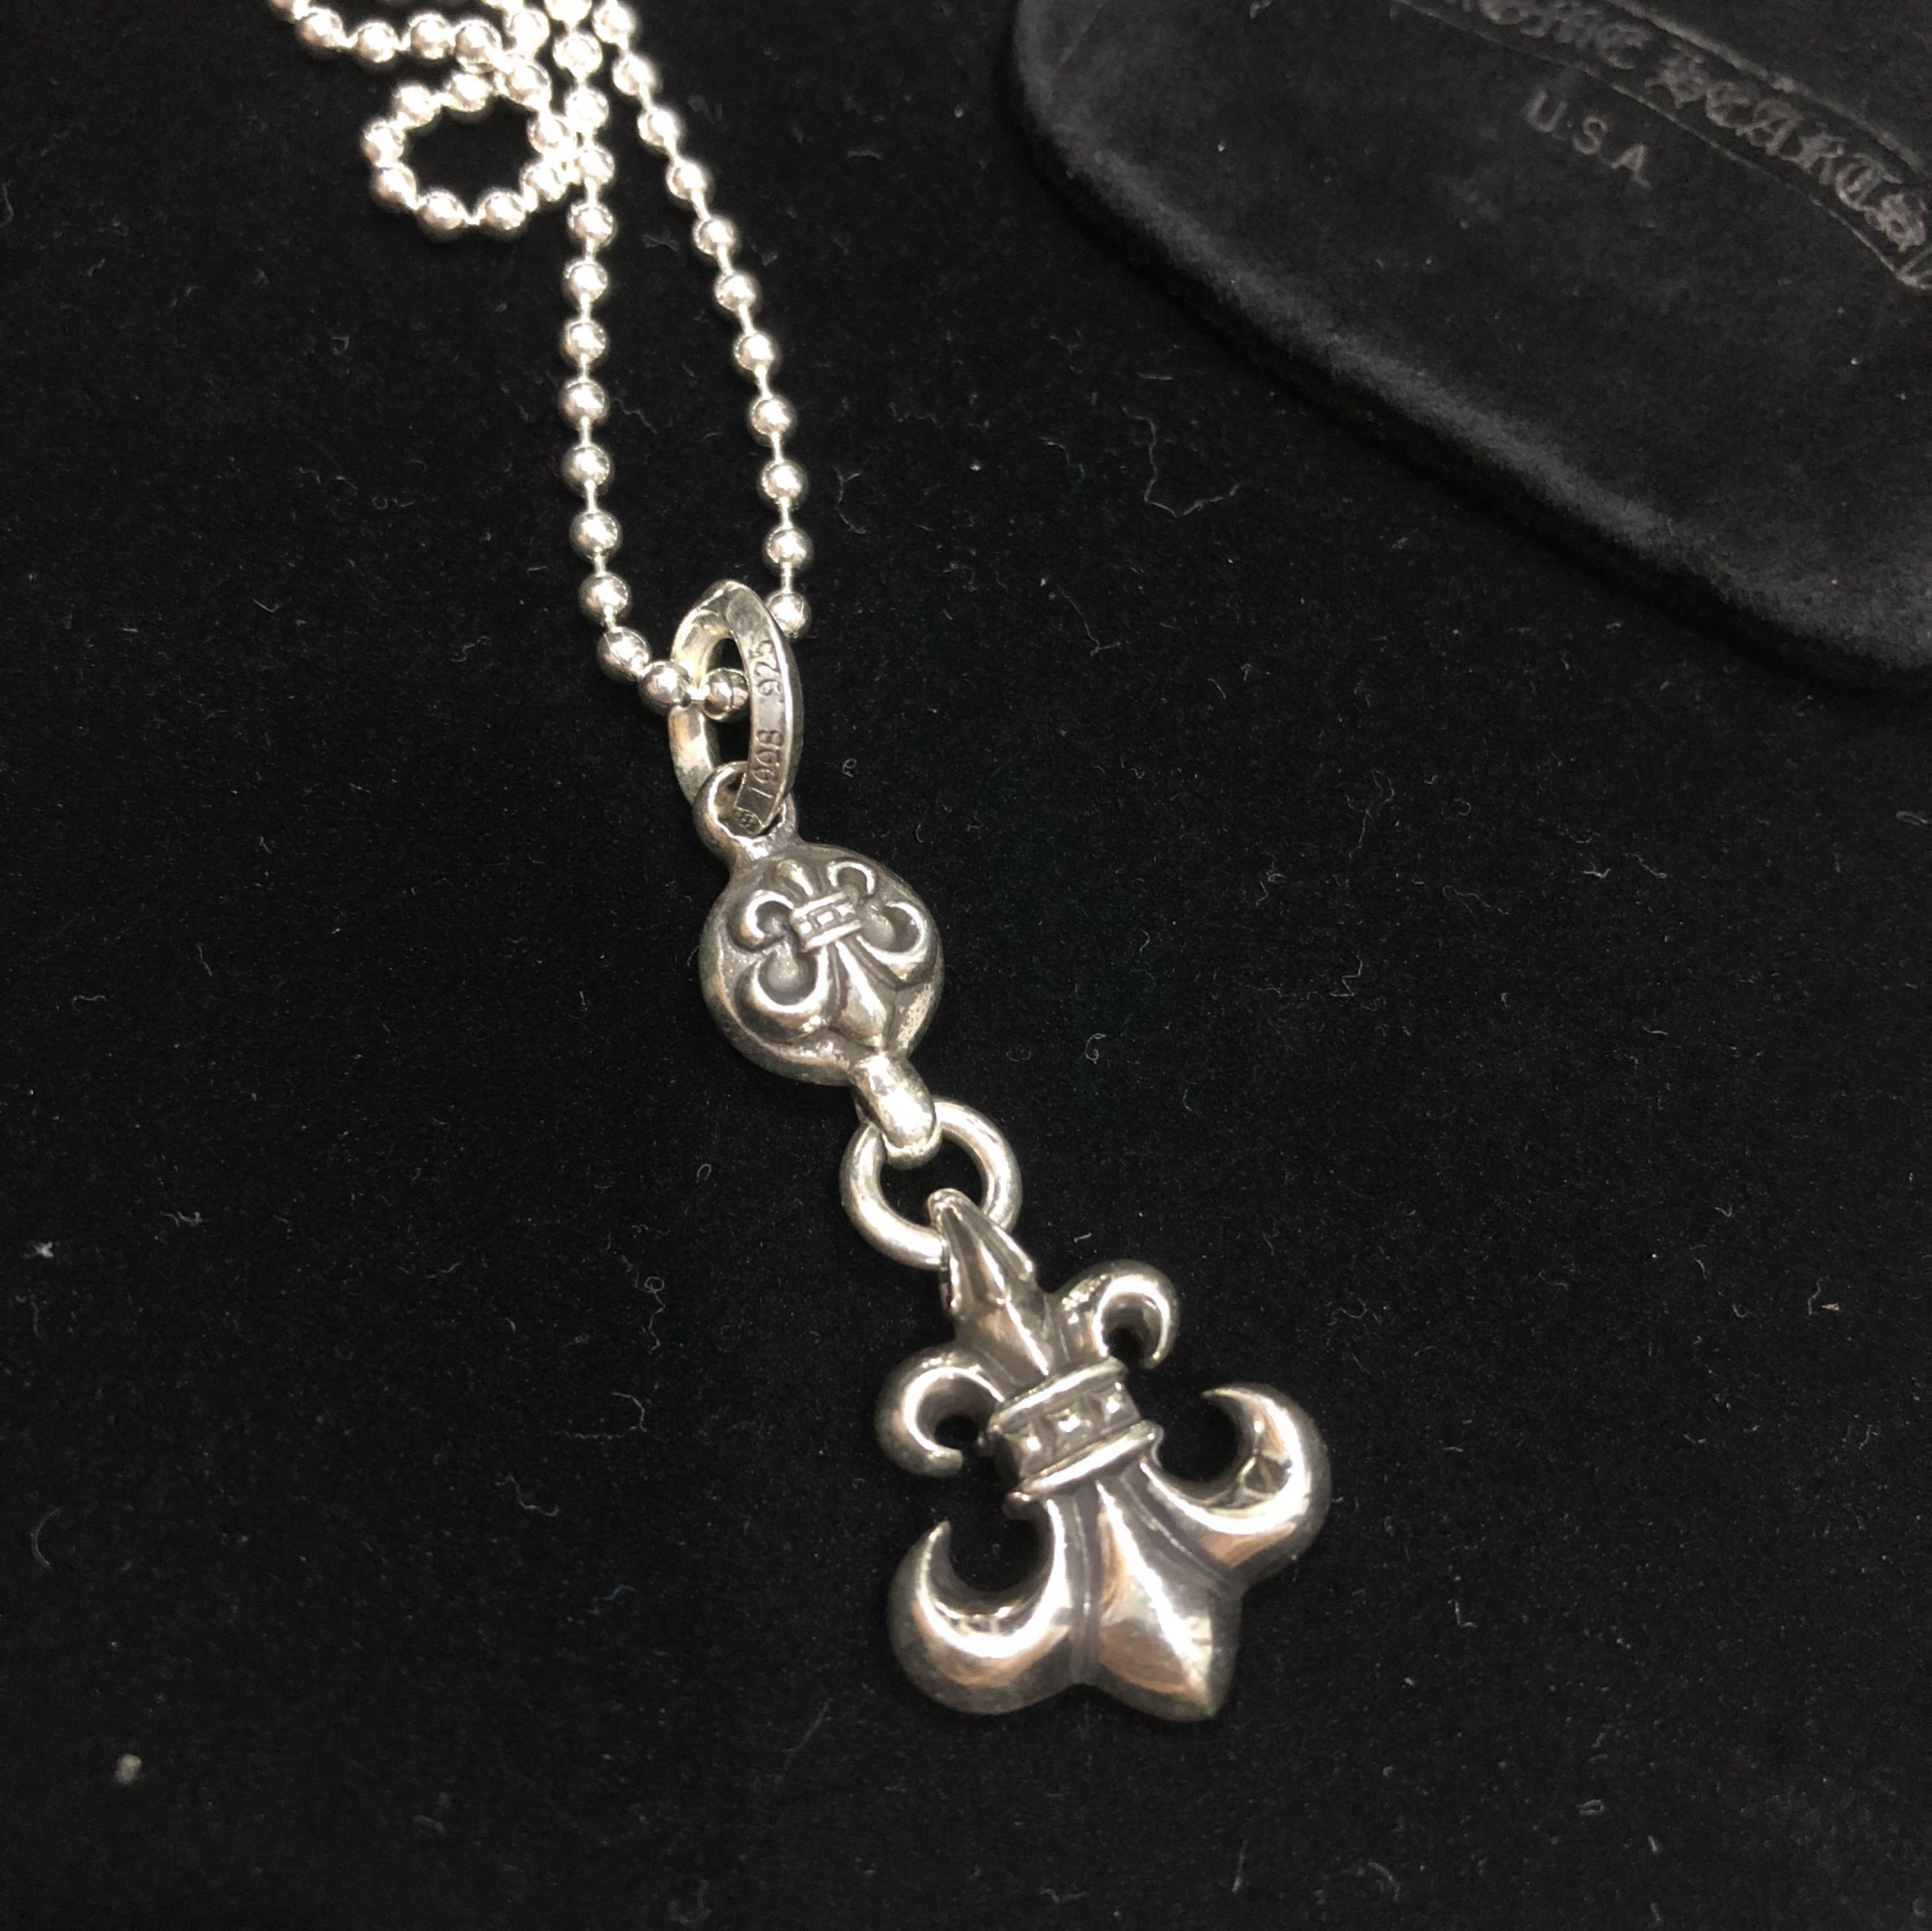 Chrome Hearts 925 Silver Fleur De Lis Pendant With Ball Chain